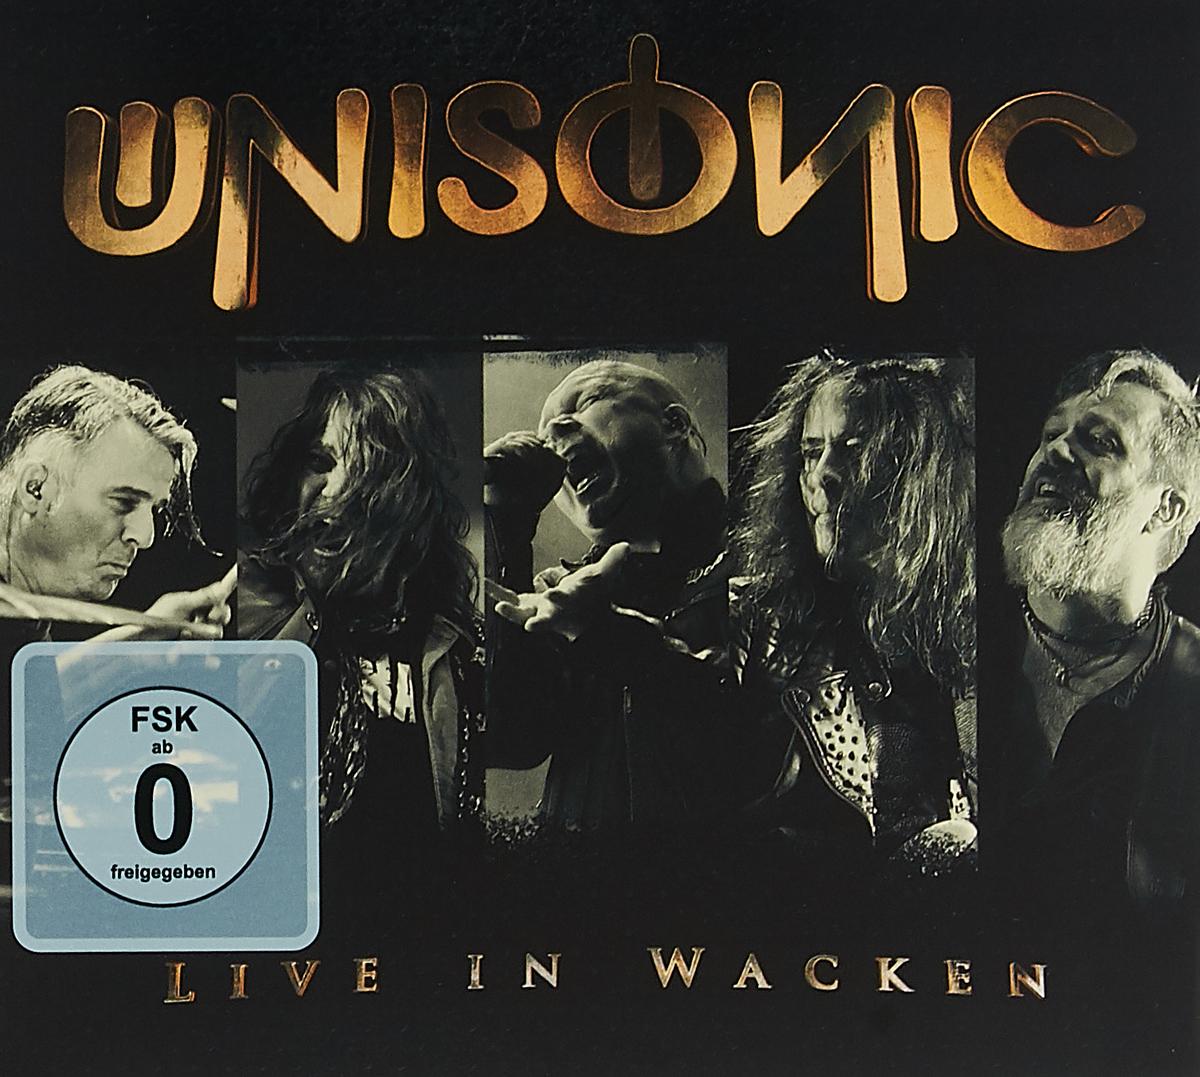 Unisonic Unisonic. Live in Wacken (CD + DVD) unisonic unisonic unisonic